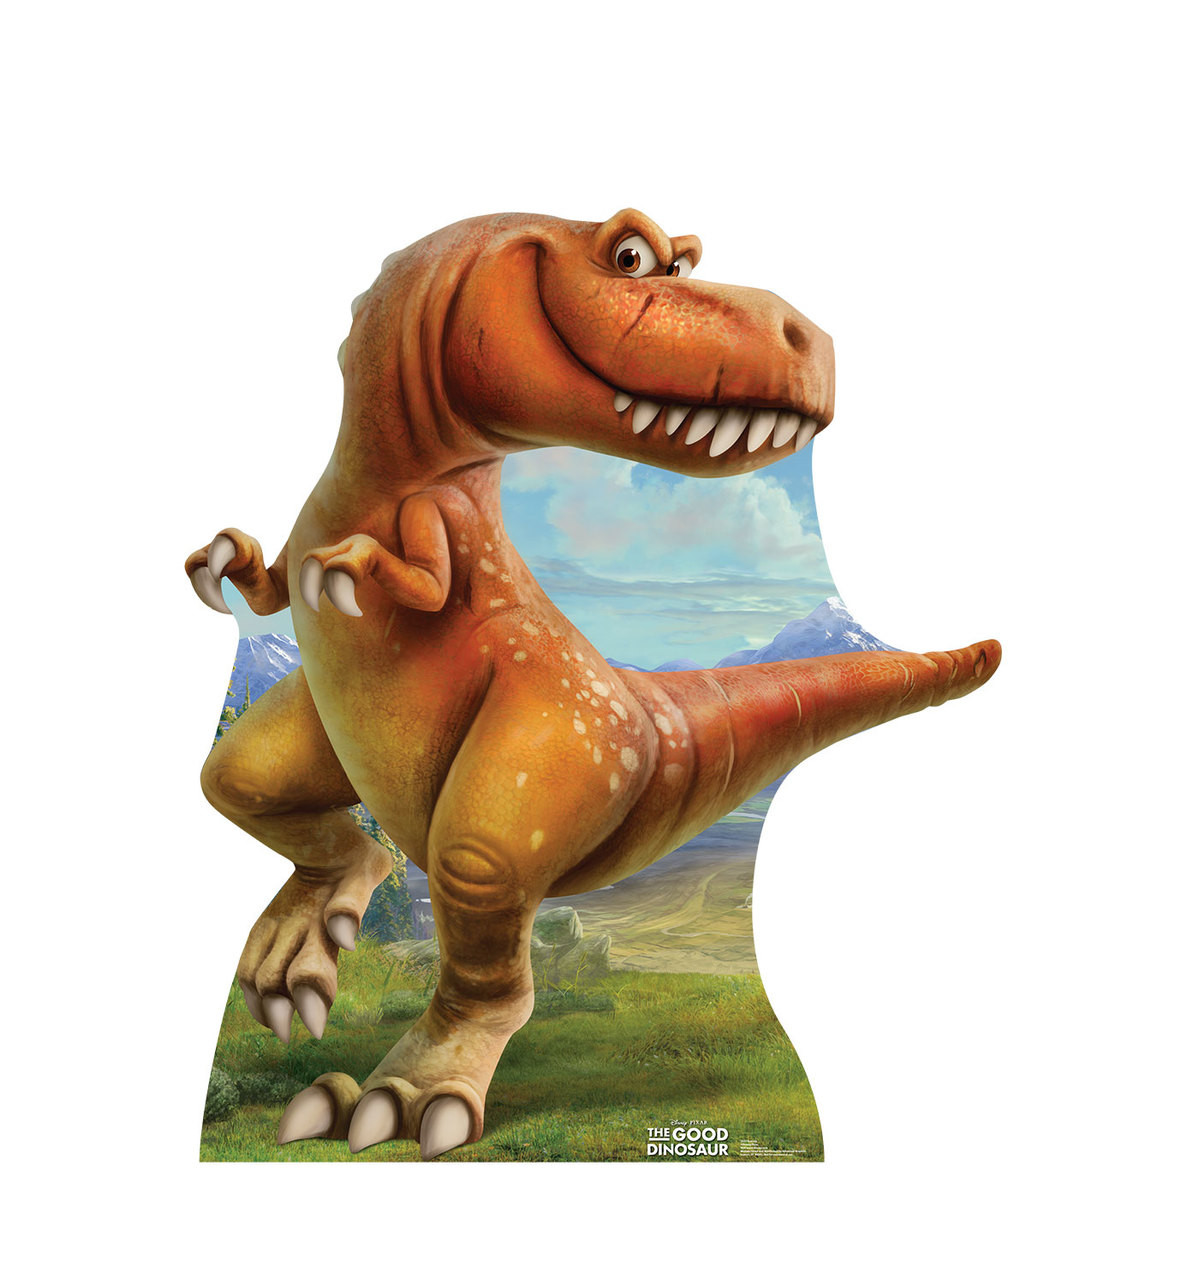 life size ramsey the good dinosaur cardboard standup cardboard cutout